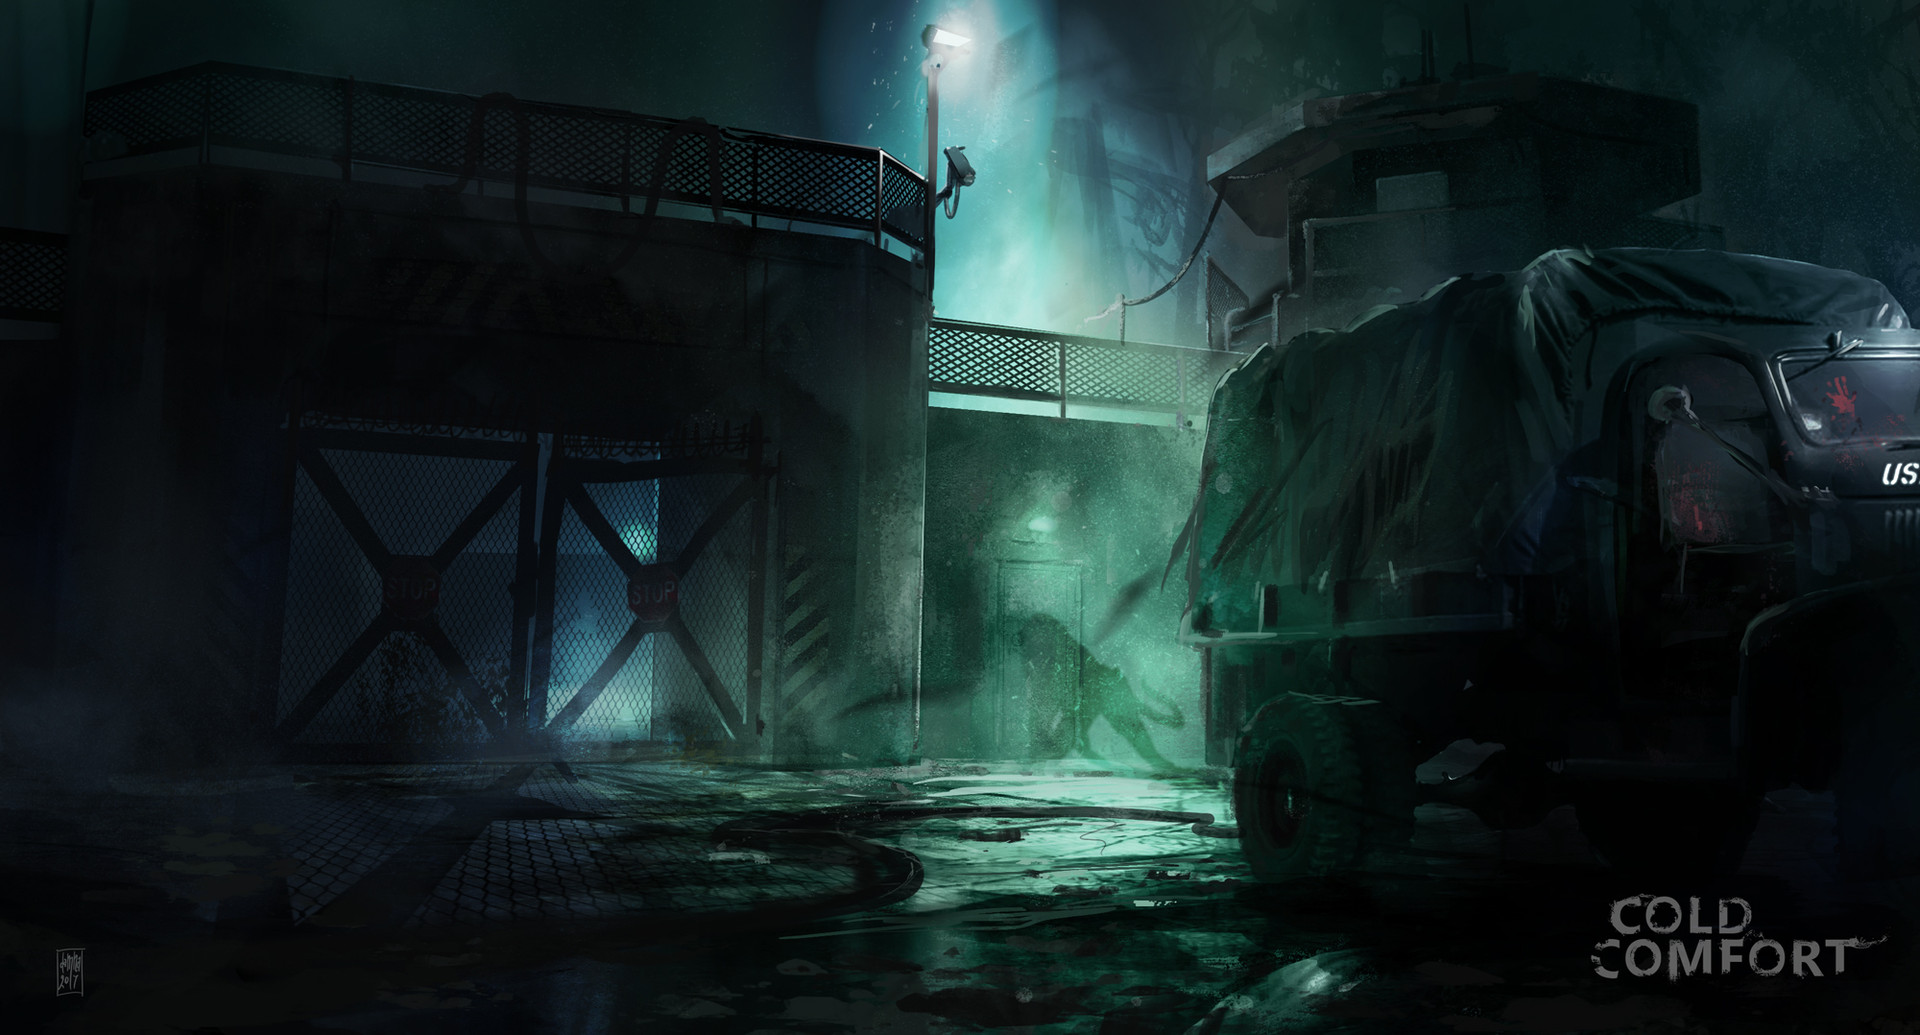 Cold confort game - Prison main-entrance